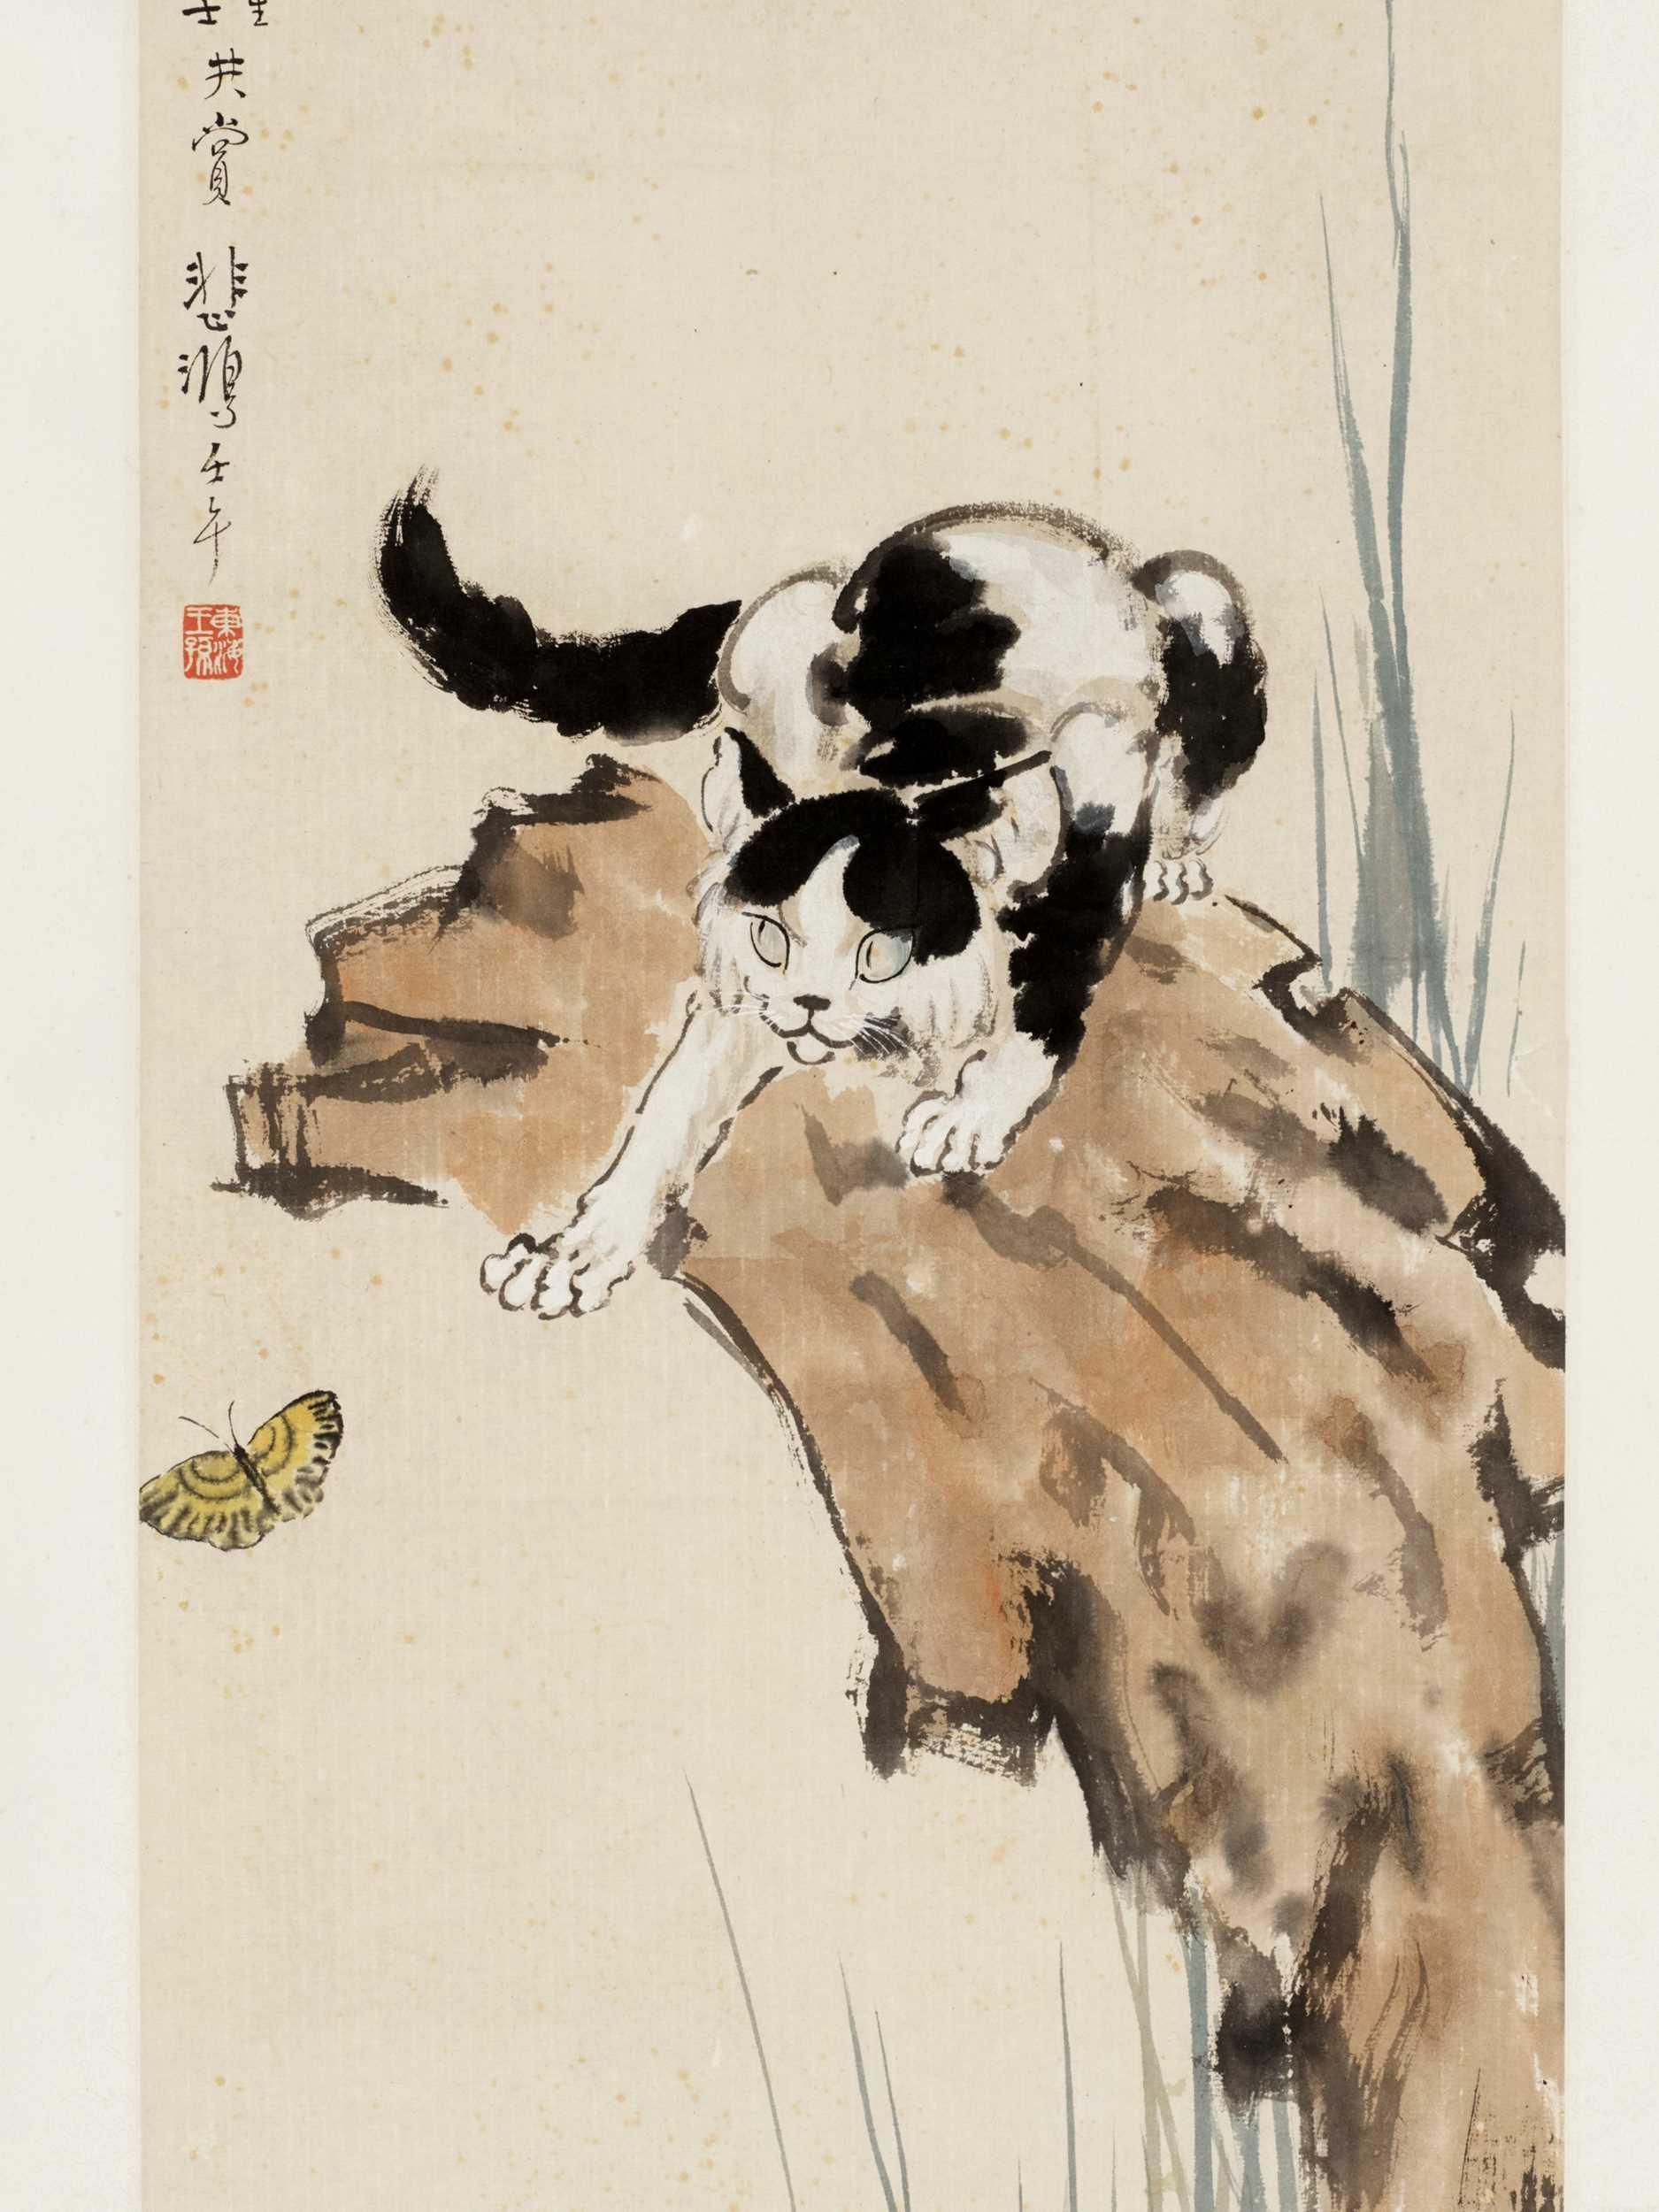 Lot 668 - 'CAT AND BUTTERFLY', LINGMAO XIDIE, BY XU BEIHONG (1895-1953)